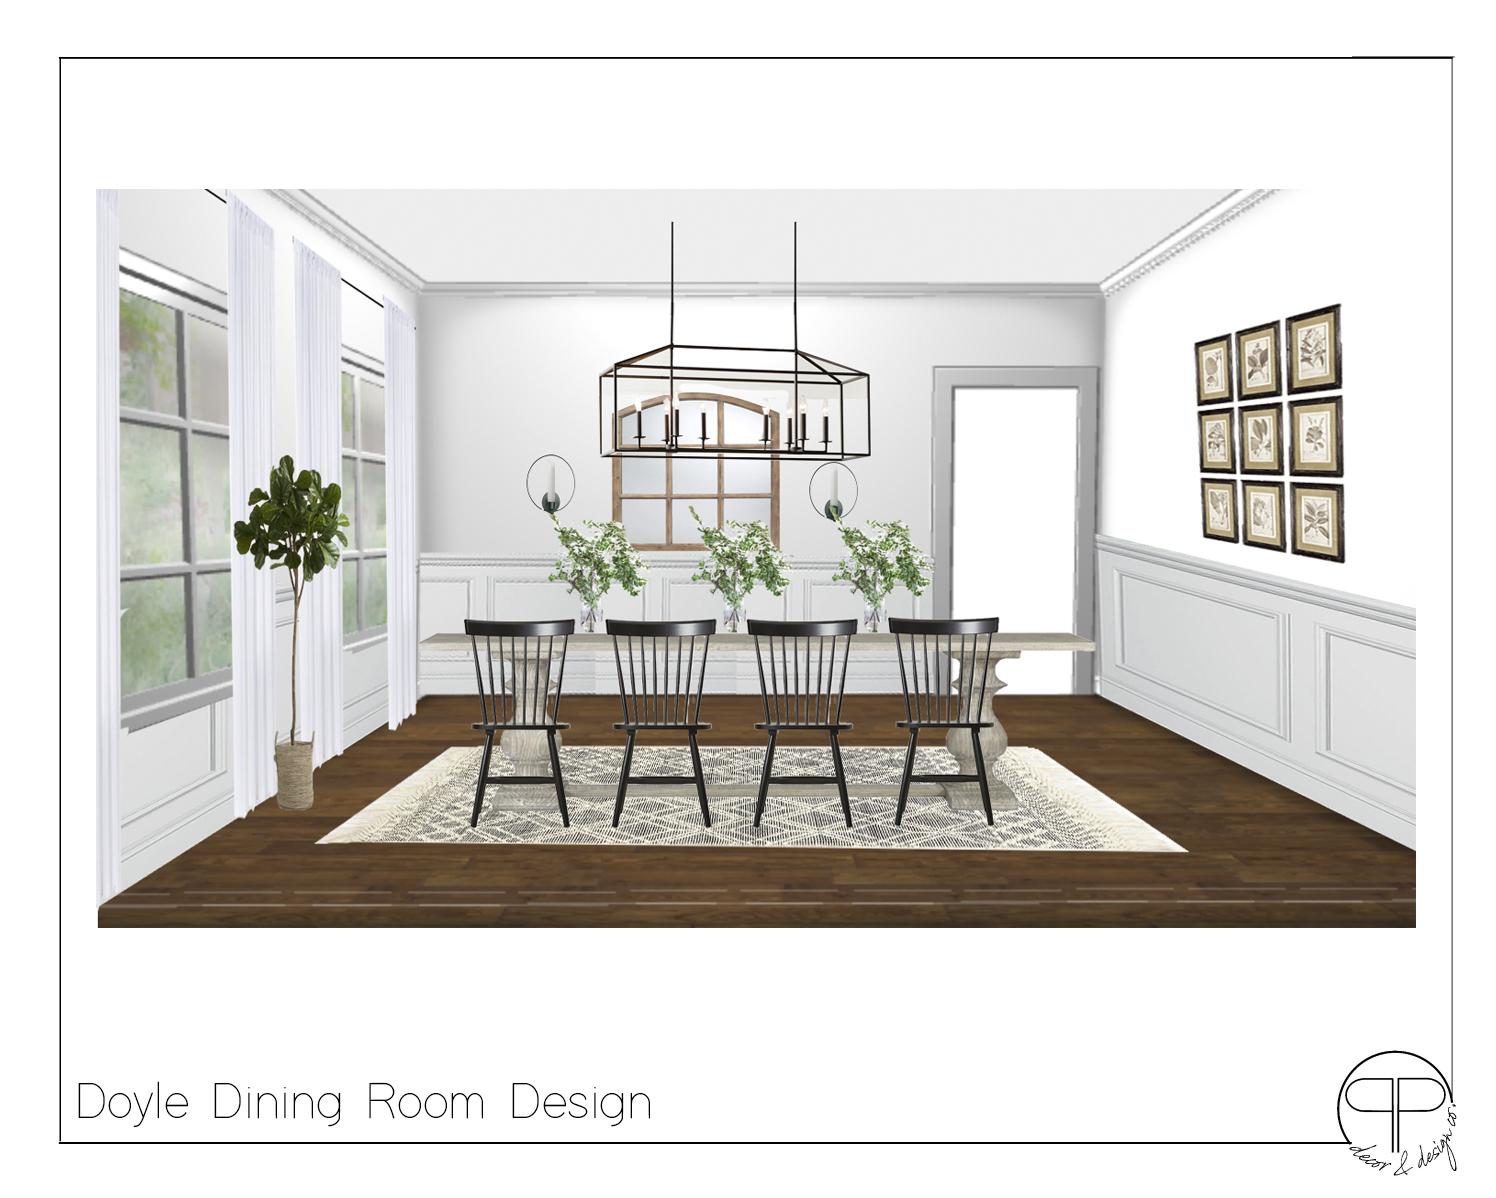 Doyle_Entryway_Design-2.jpg